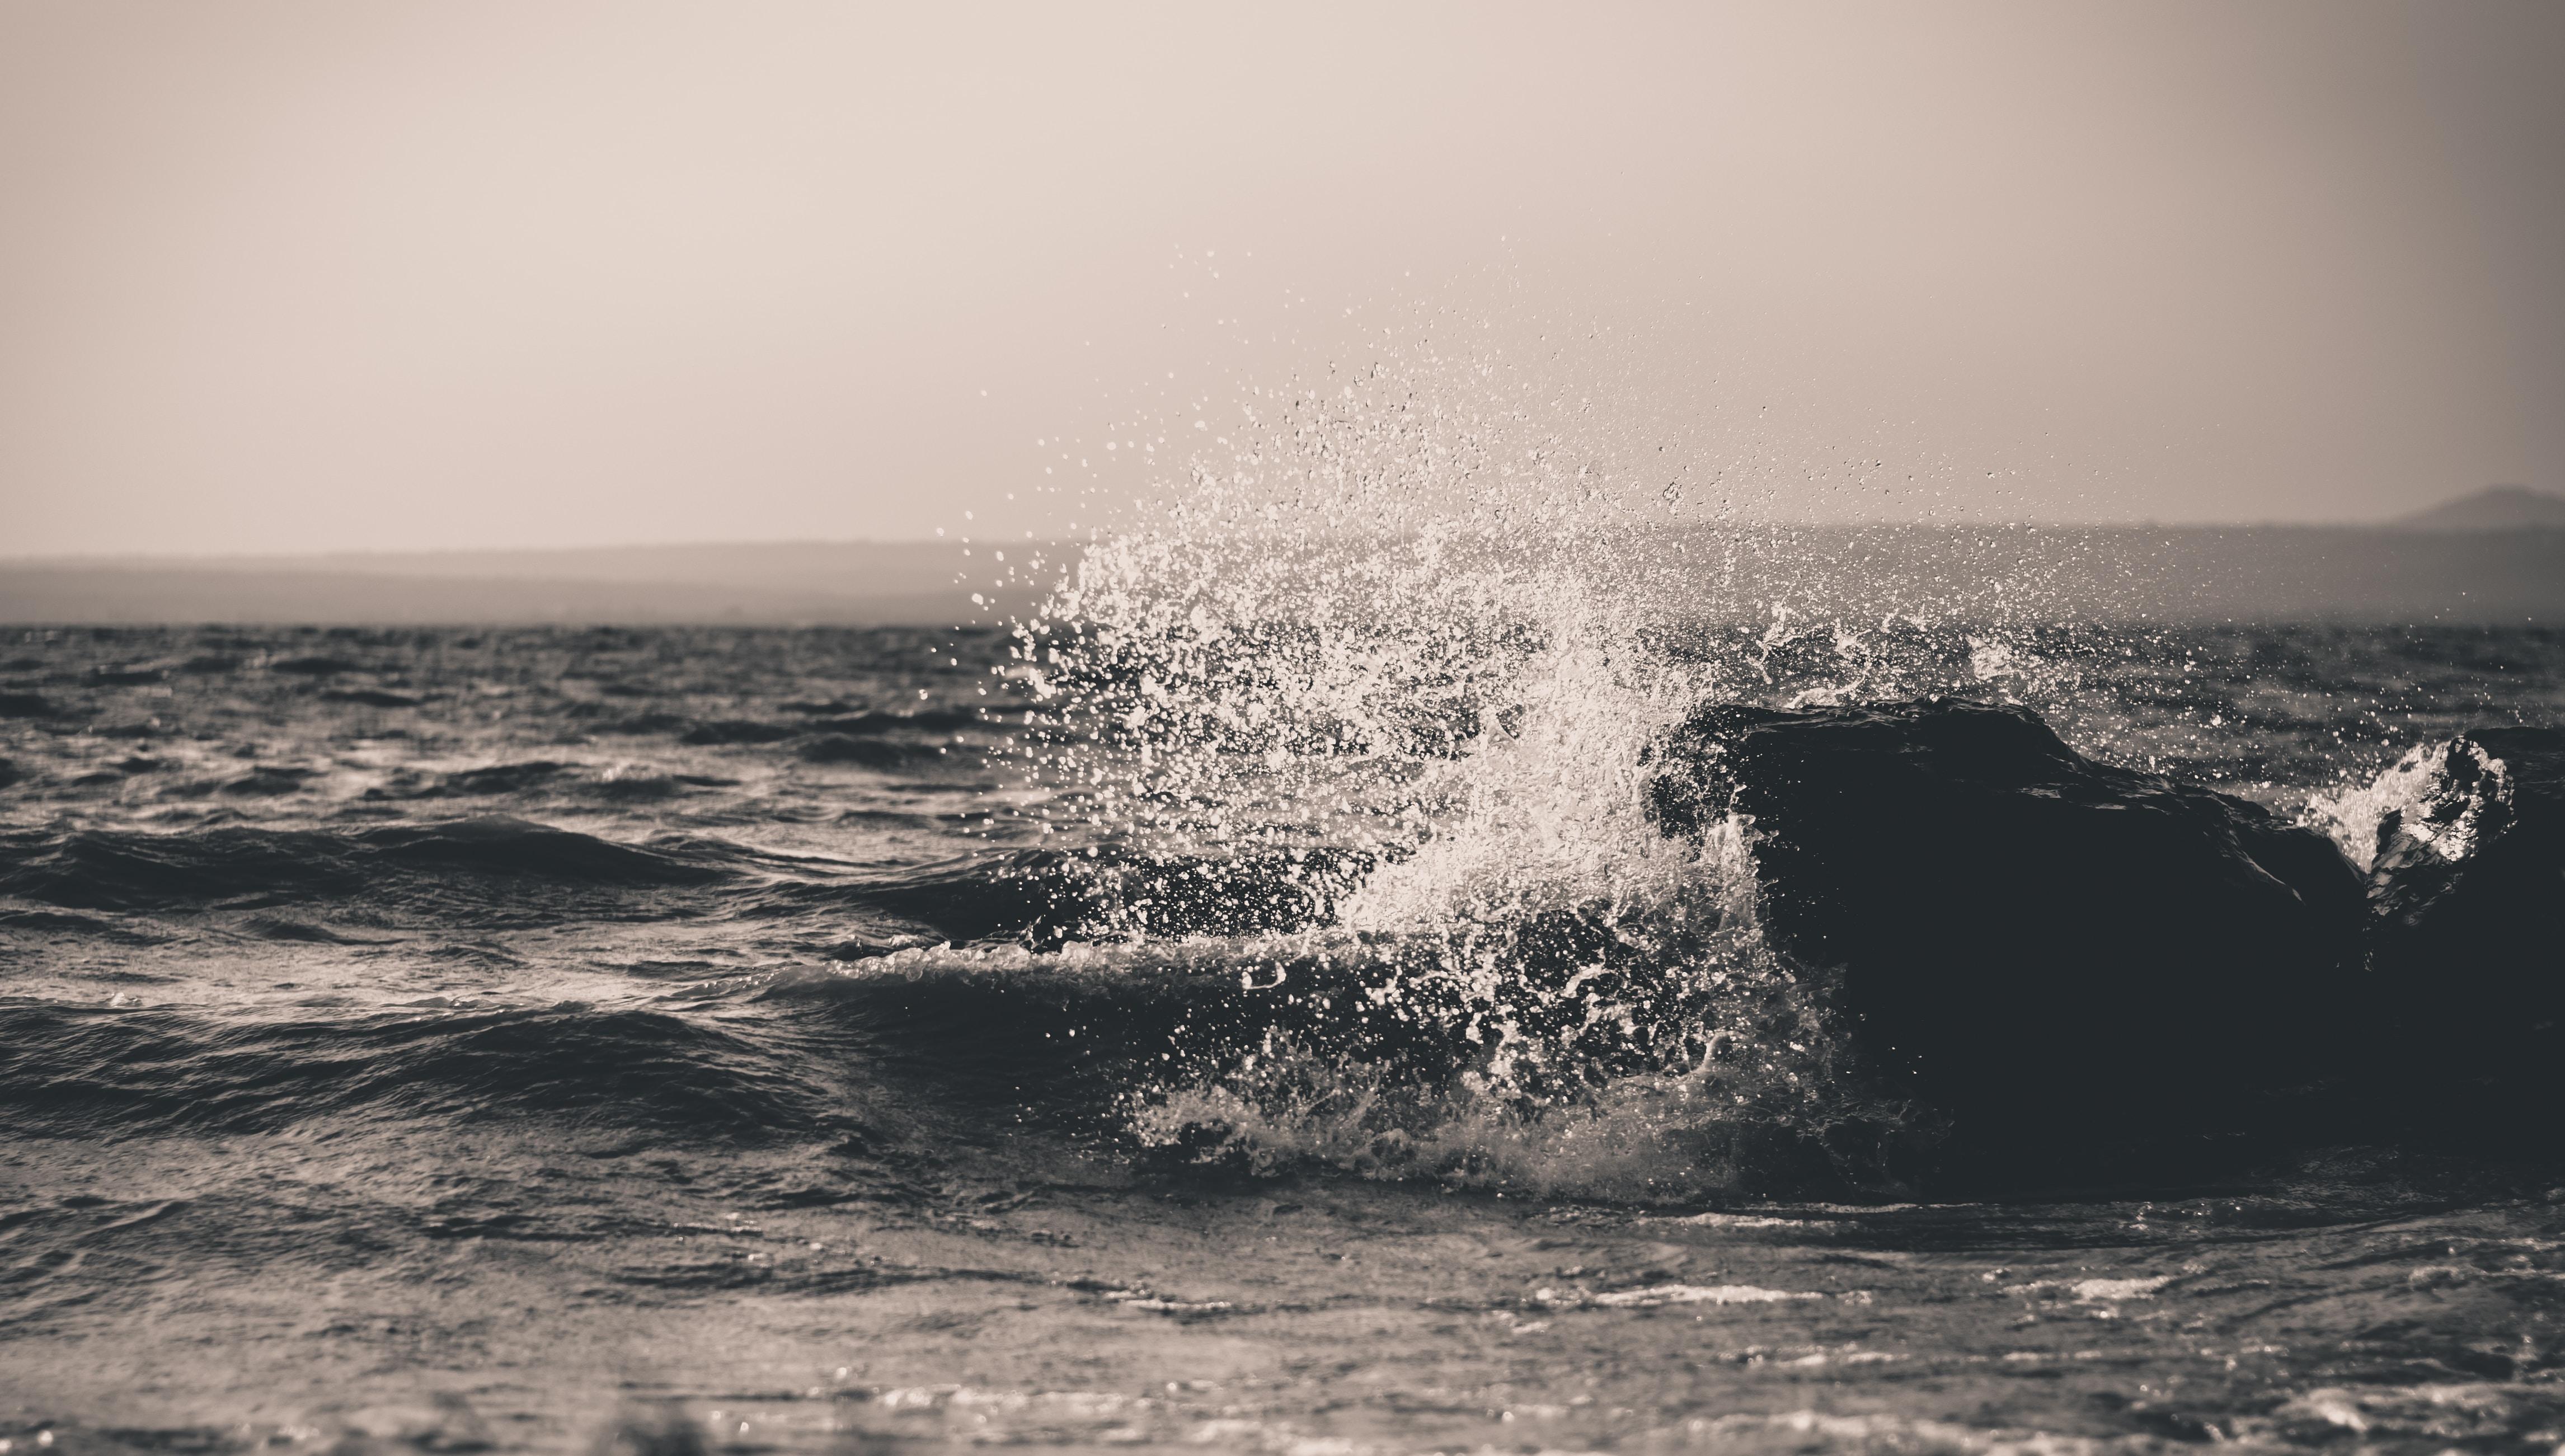 A black and white shot of water splashing over dark waves